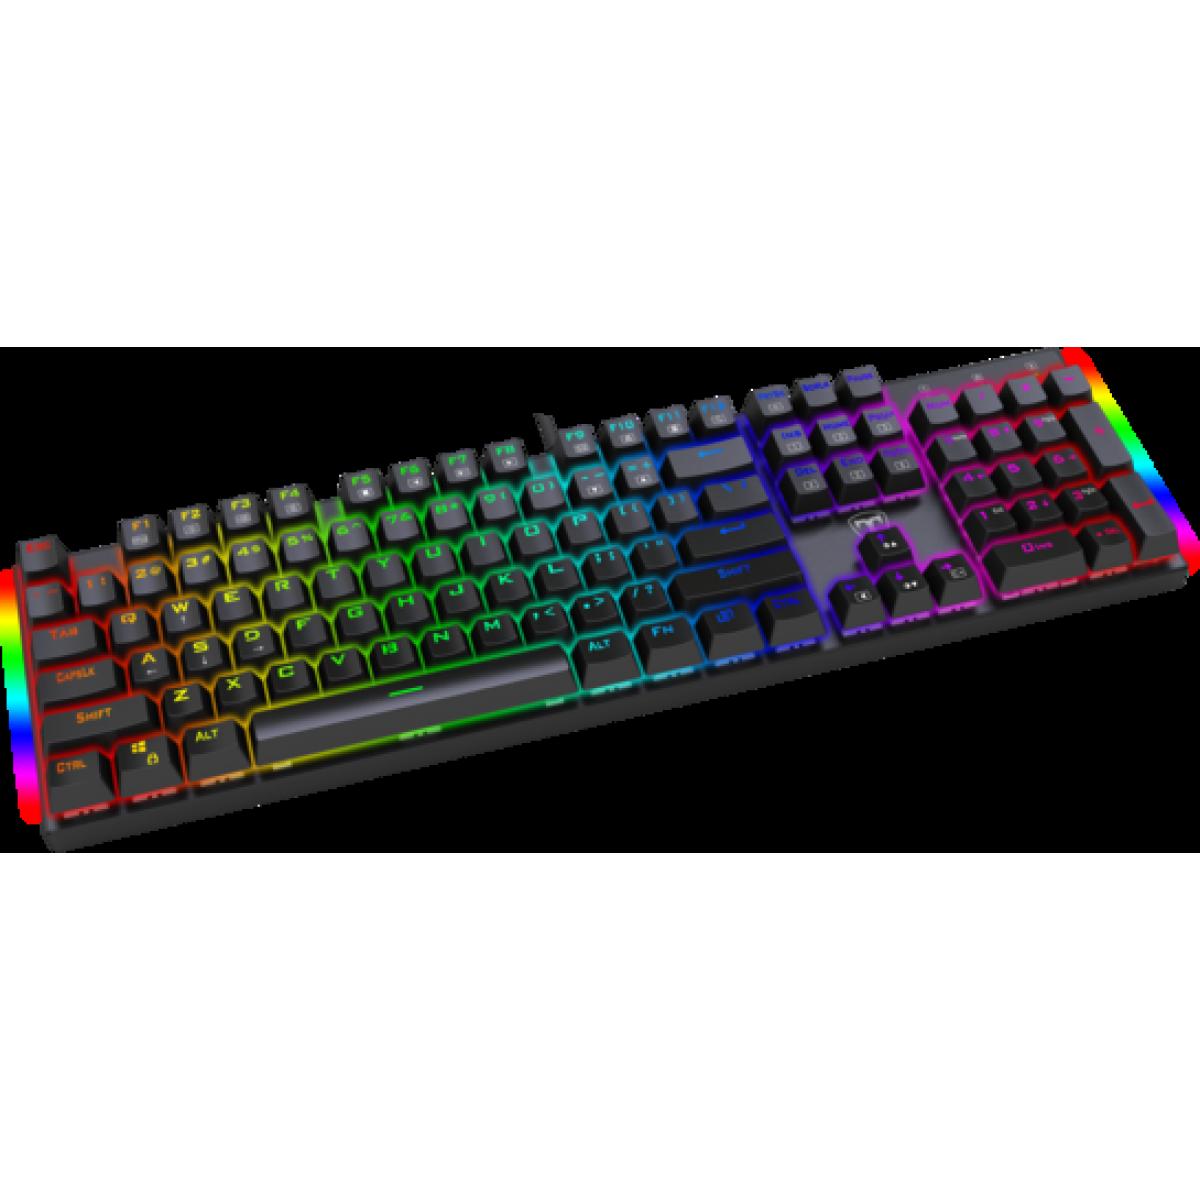 Teclado Gamer Mecânico T-Dagger Frigate RGB, Switch Blue, Black, T-TGK306